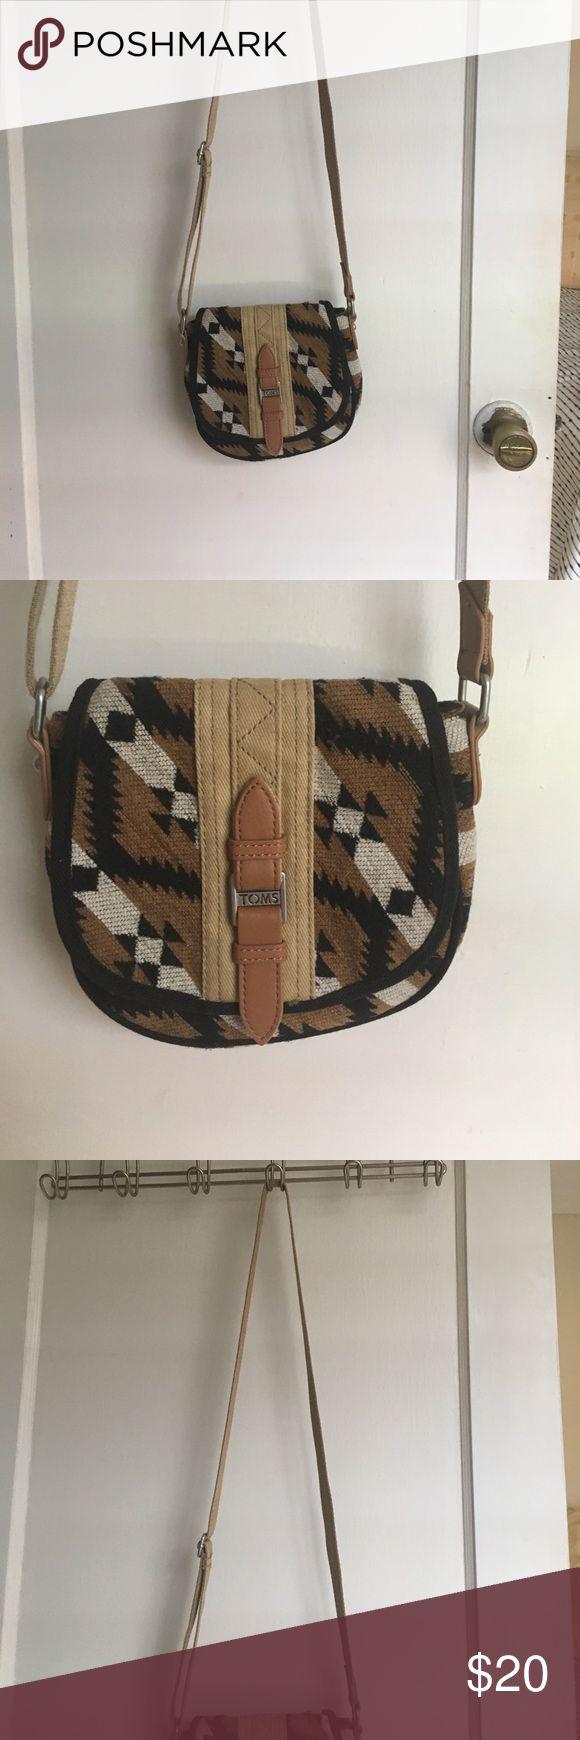 Toms cross body aztec bag Toms cross body, aztec design, fabric bag. Great condition Toms Bags Crossbody Bags